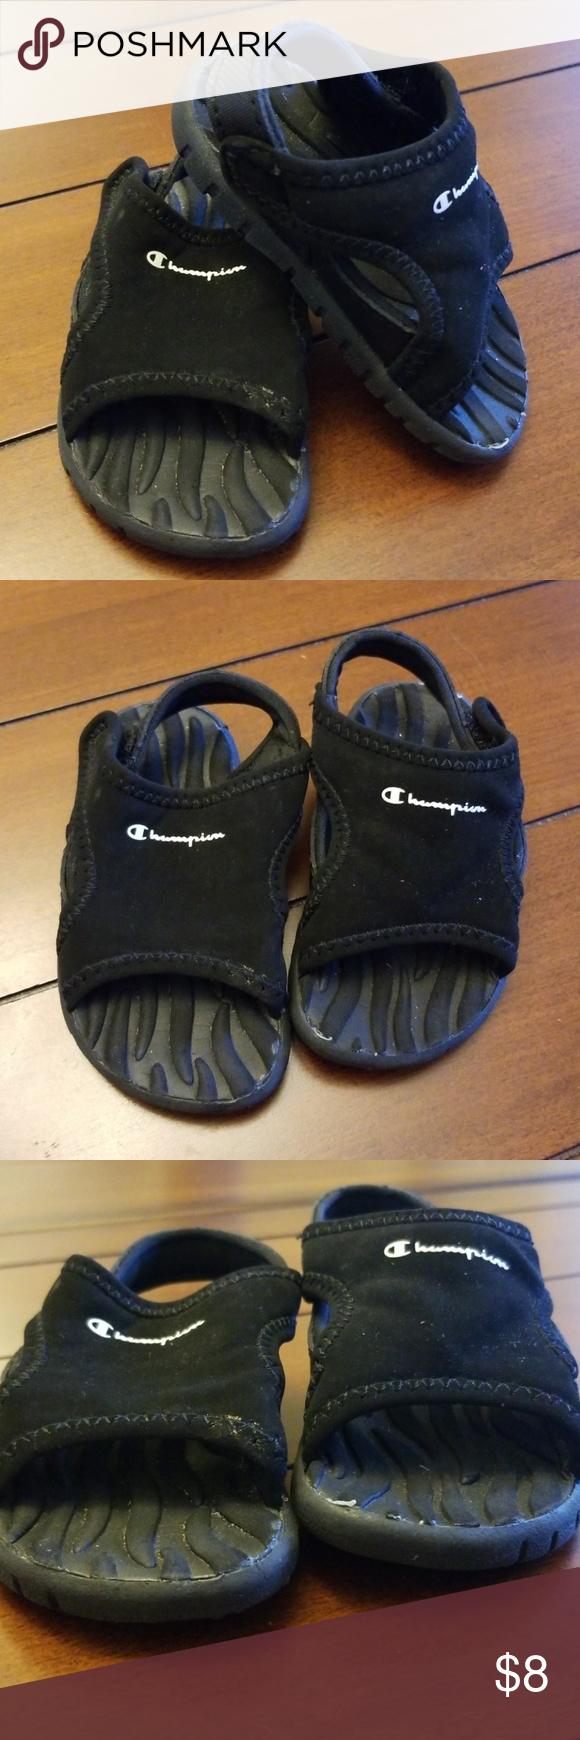 04b553211455 Champion Baby sandals Baby sandals size 3W. Good condition. Velcro straps. Champion  Shoes Sandals   Flip Flops